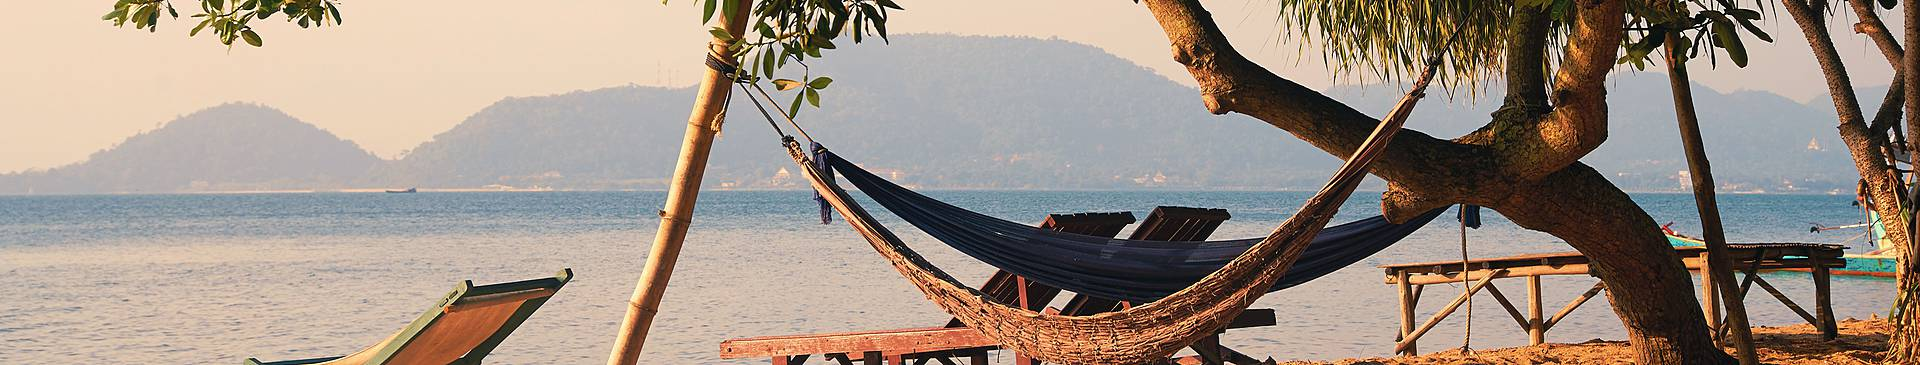 Inseln Kambodscha Reisen